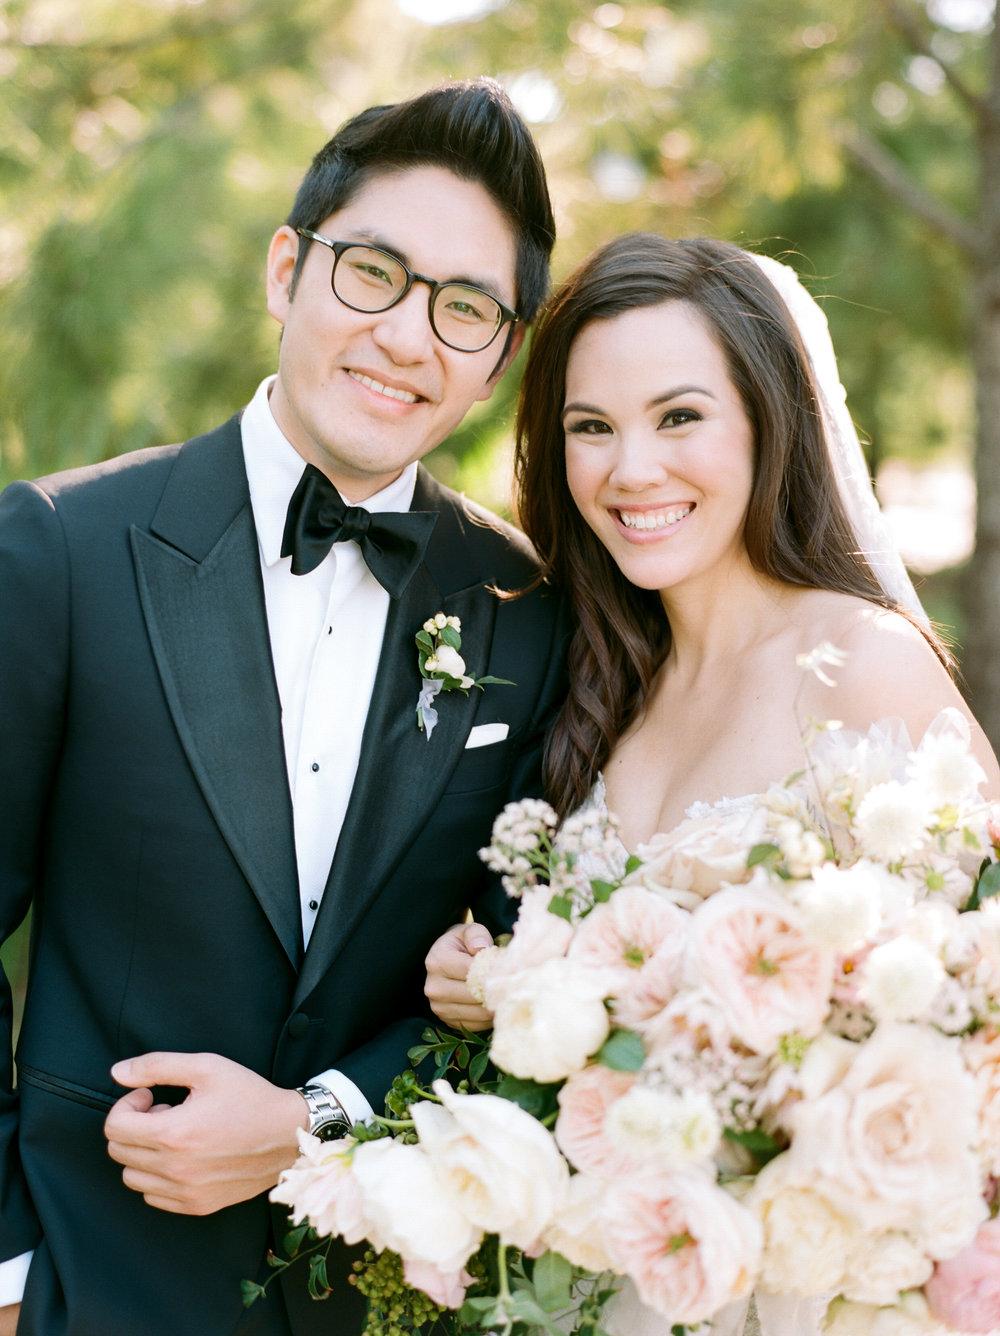 Martha-Stewart-Wedding-Dana-Fernandez-Photography-Josh-Texas-Film-Houston-Wedding-Fine-Art-Photographer-McGovern-Centennial-Gardens-Top-Best-39.jpg